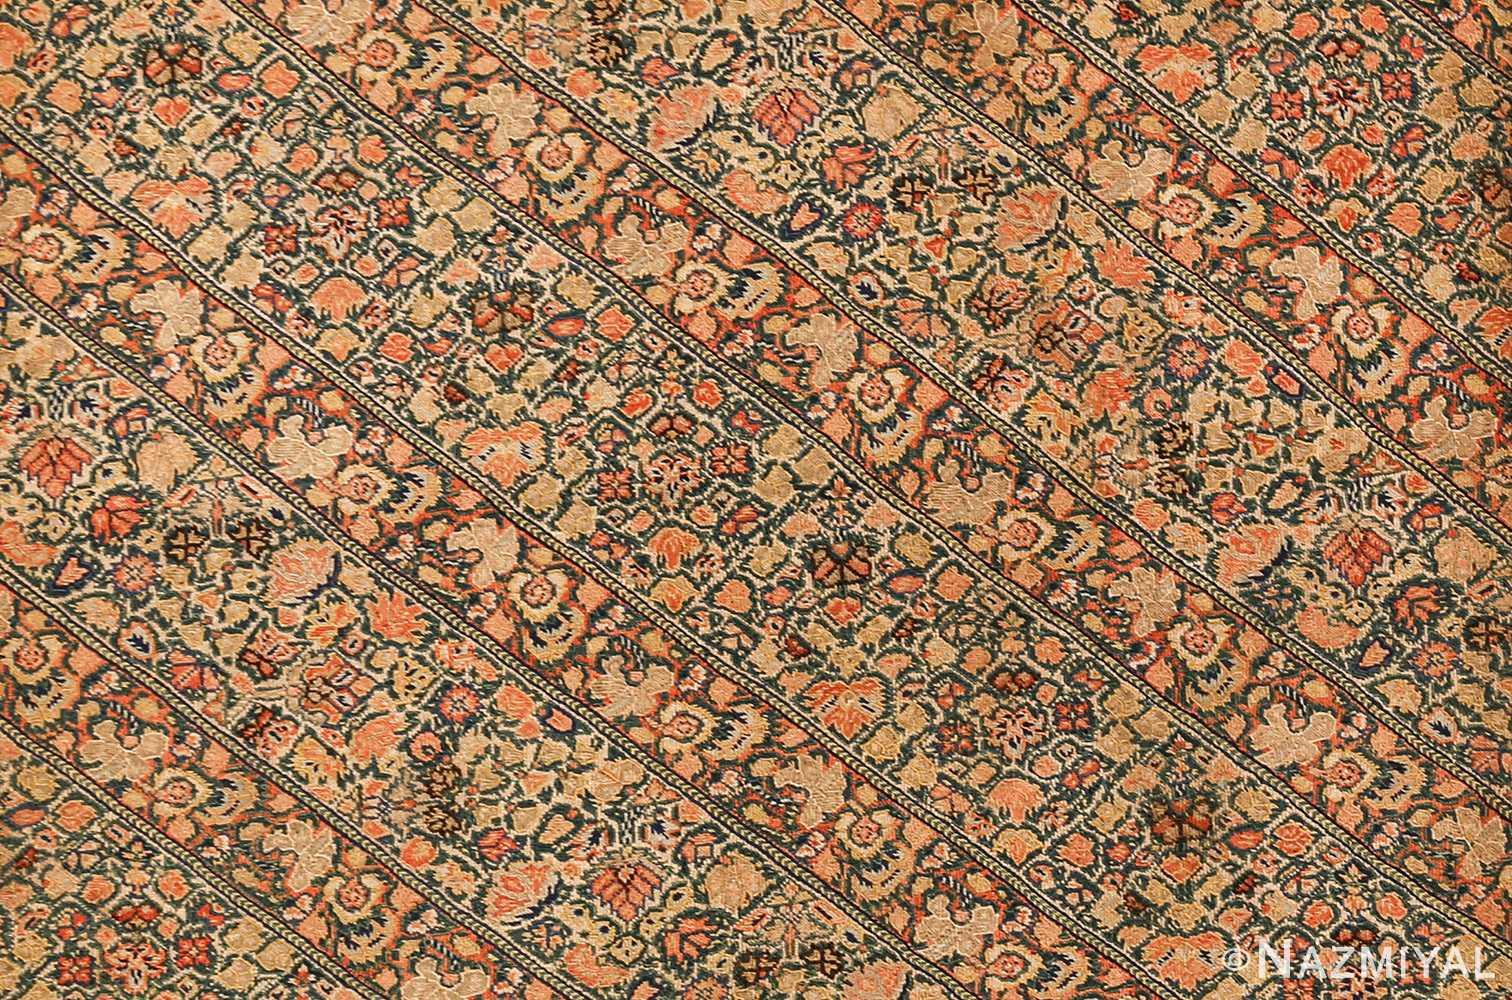 17th century zanjan persian textile 40908 full Nazmiyal